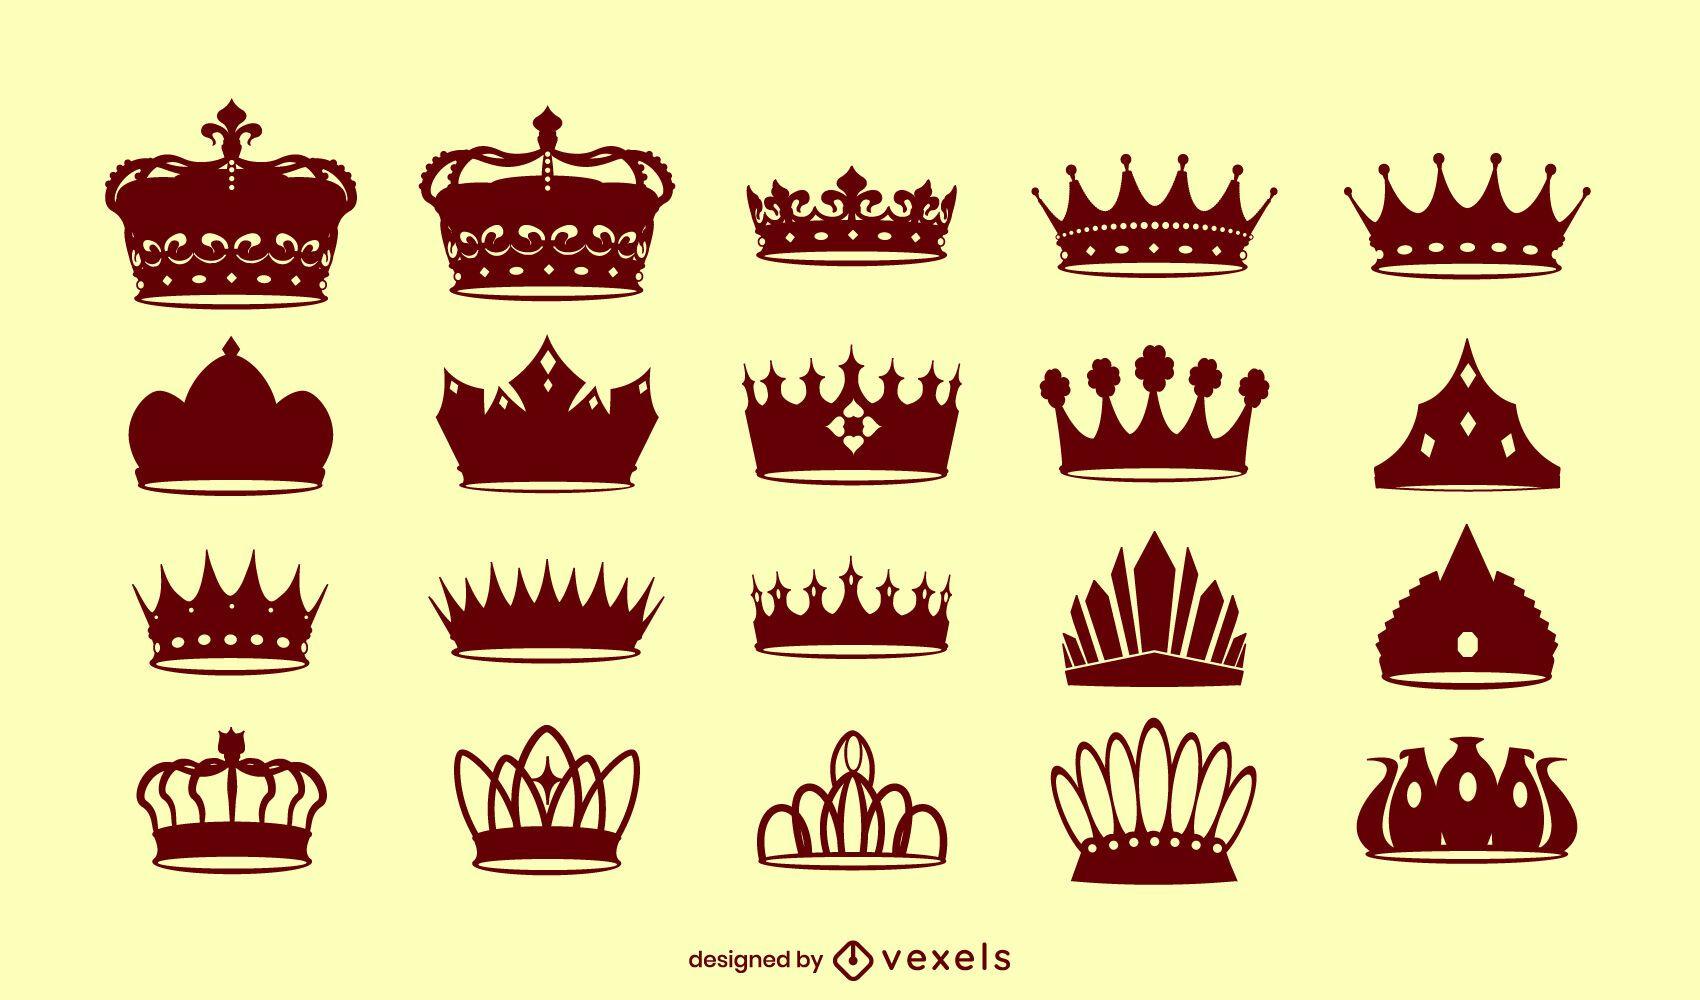 Royal crowns king silhouette set